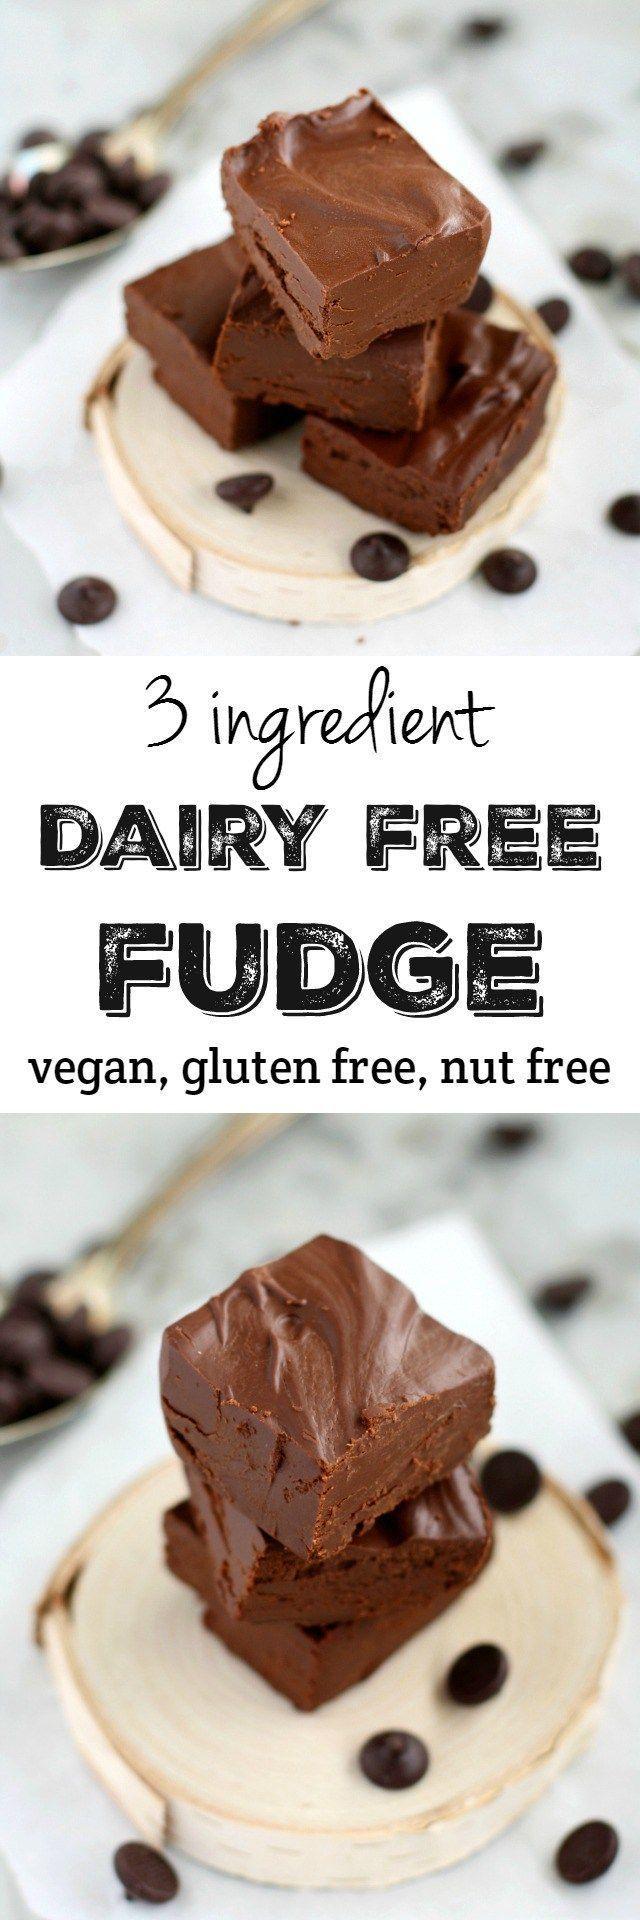 3 ingredient dairy free fudge rezept vegan dessert recipes pinterest veganer glutenfrei. Black Bedroom Furniture Sets. Home Design Ideas